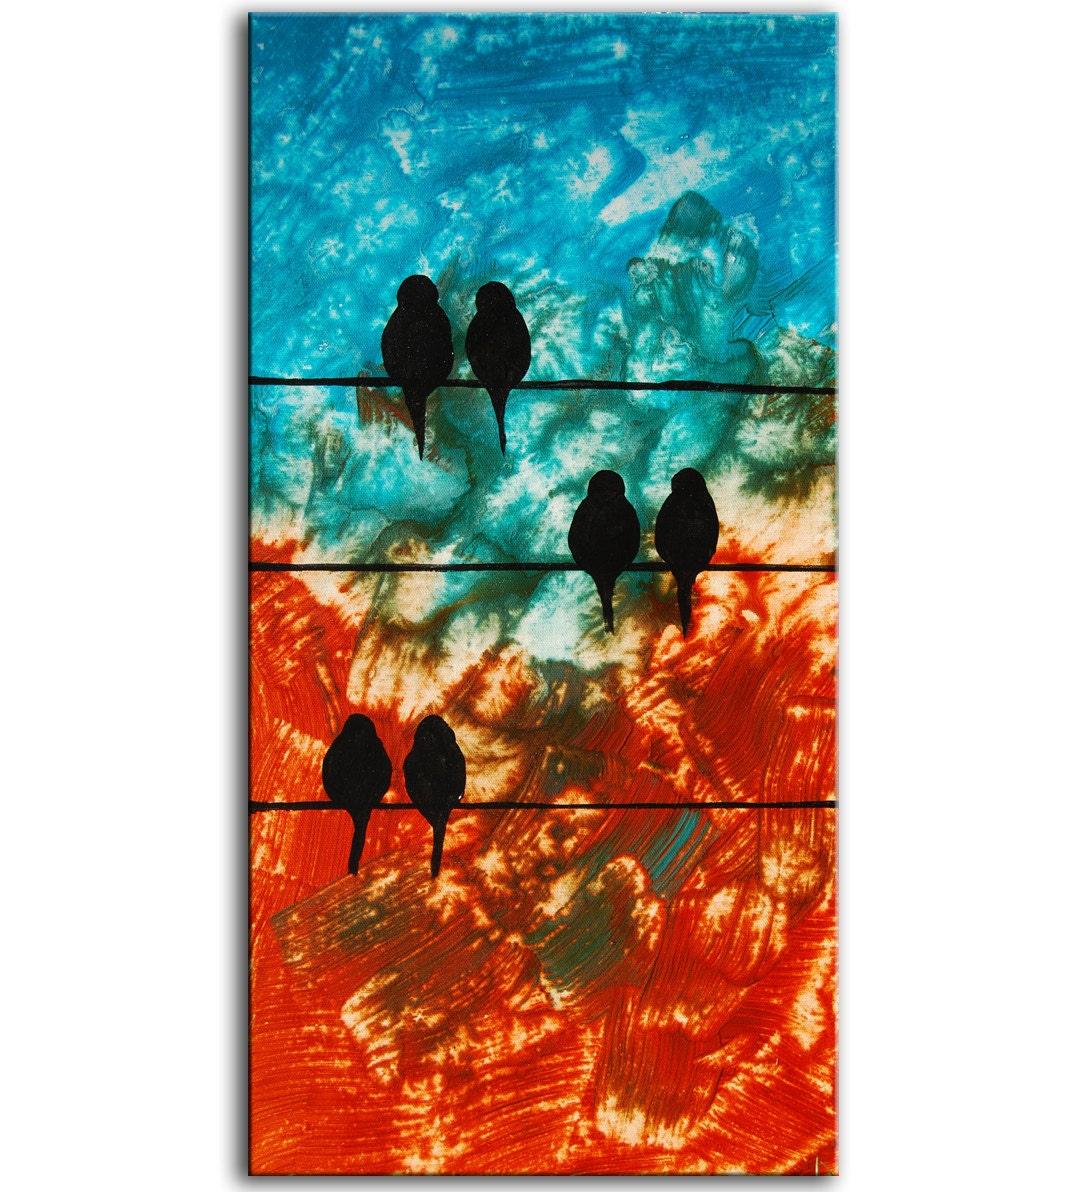 Bird paintings modern - photo#17